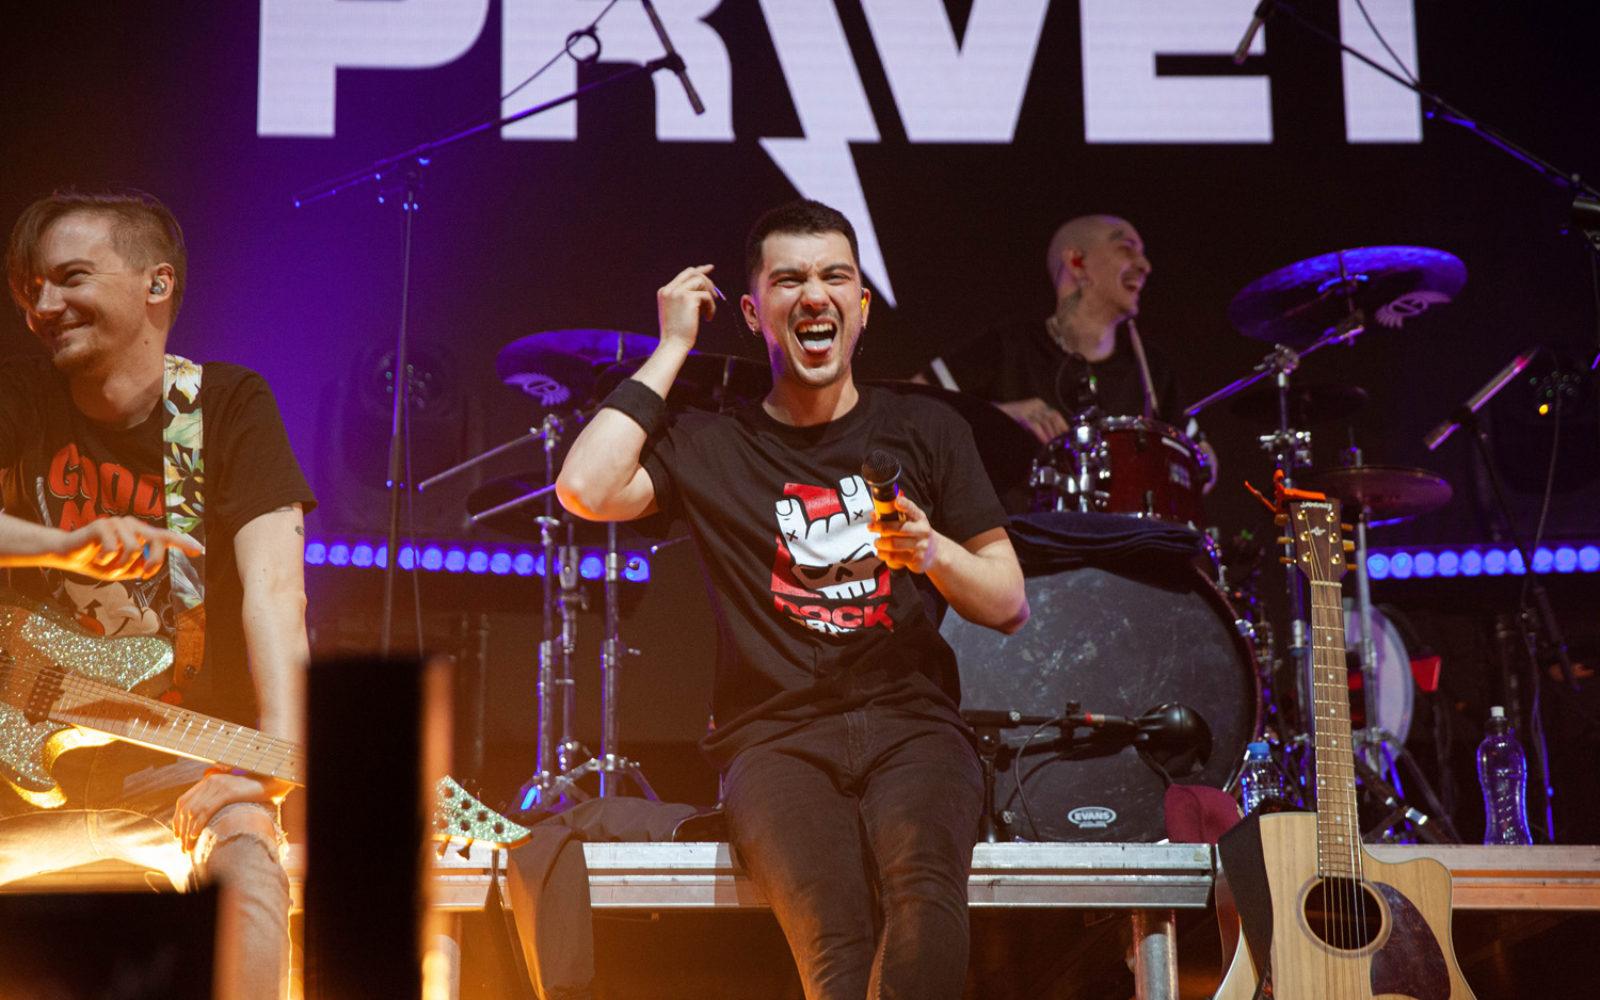 rock_privet (81 of 98)